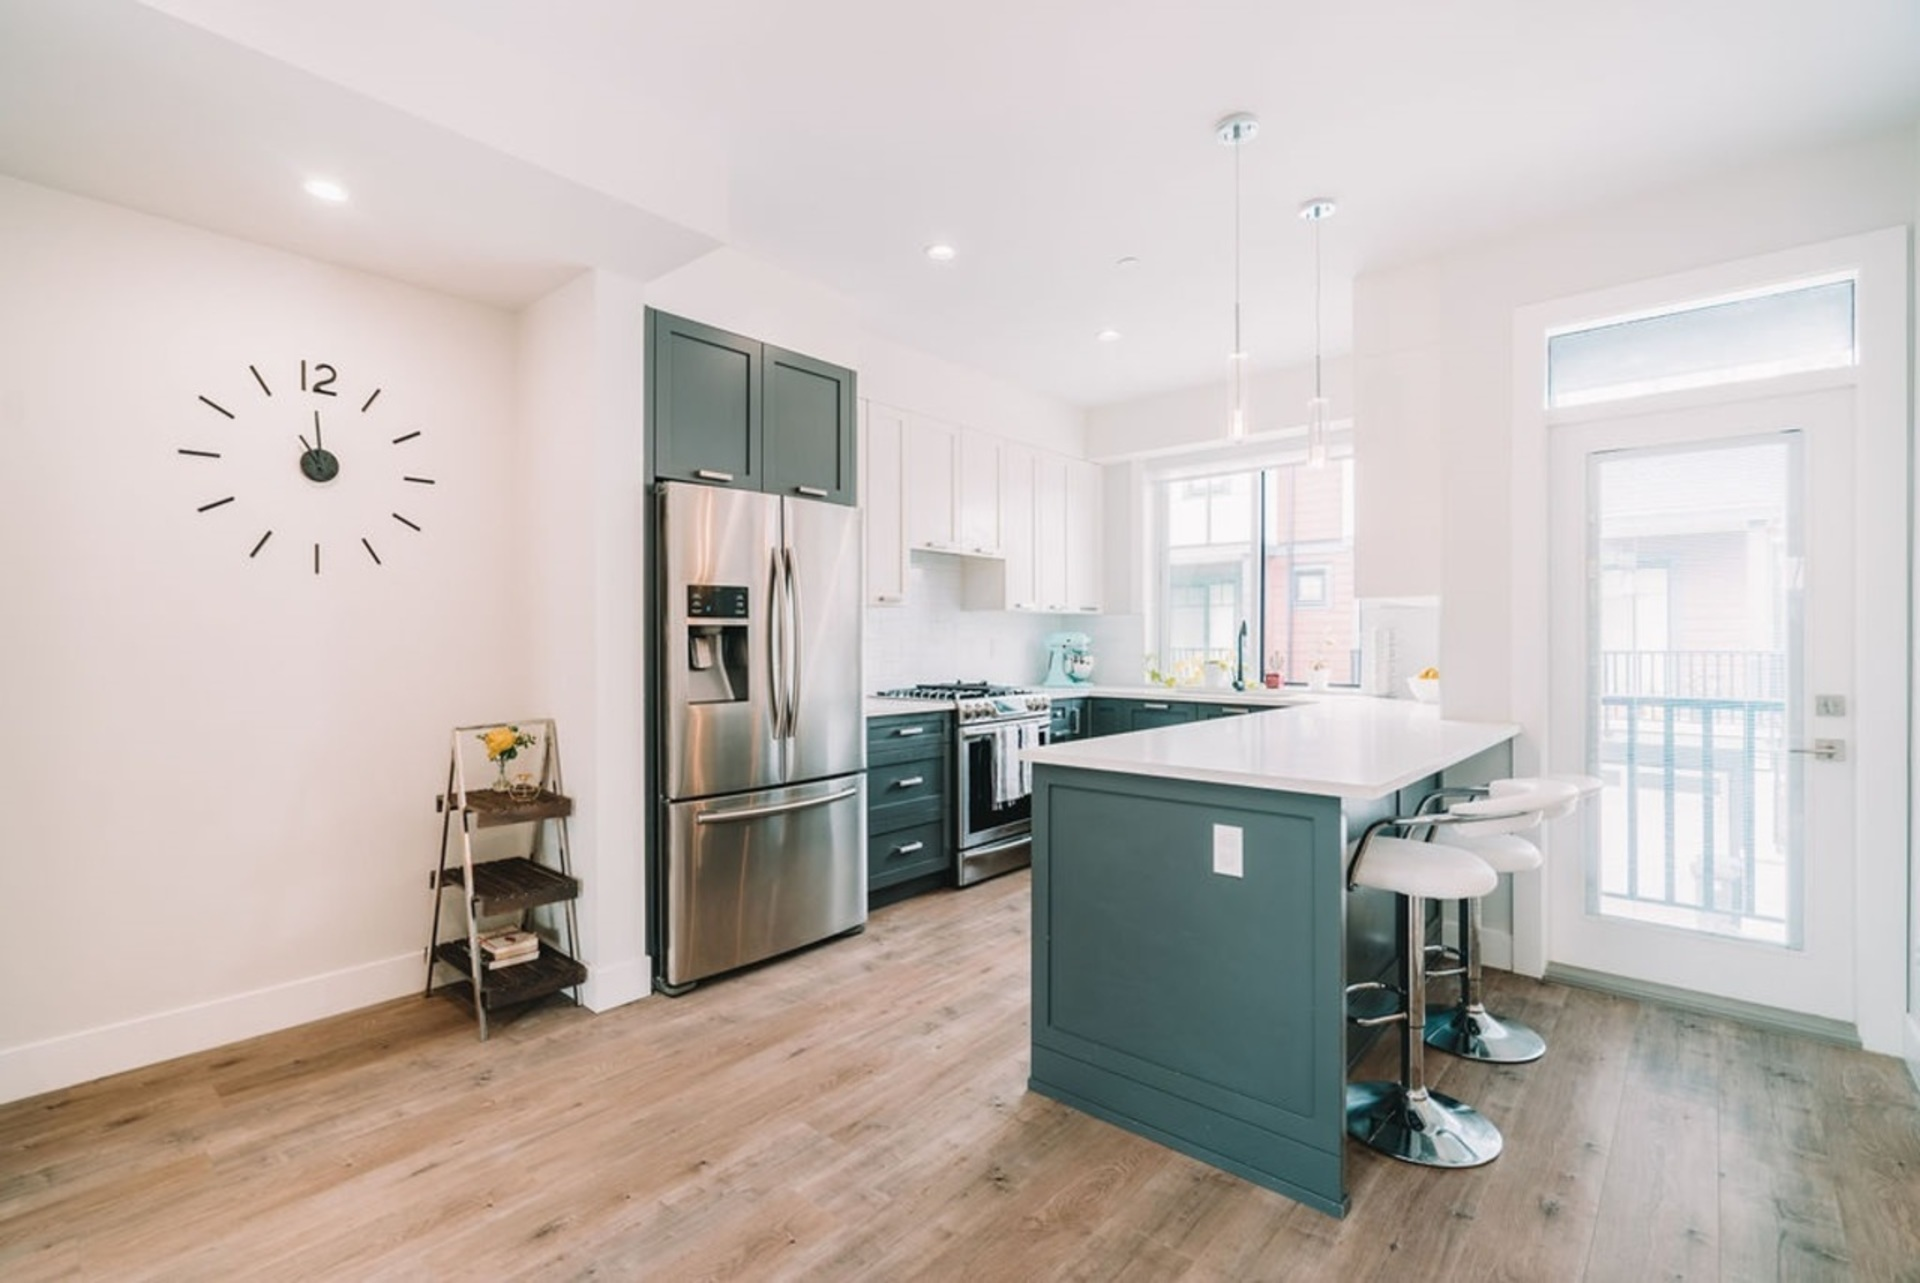 188-wood-street-queensborough-new-westminster-15 of 50 - 188 Wood Street, Queensborough, New Westminster